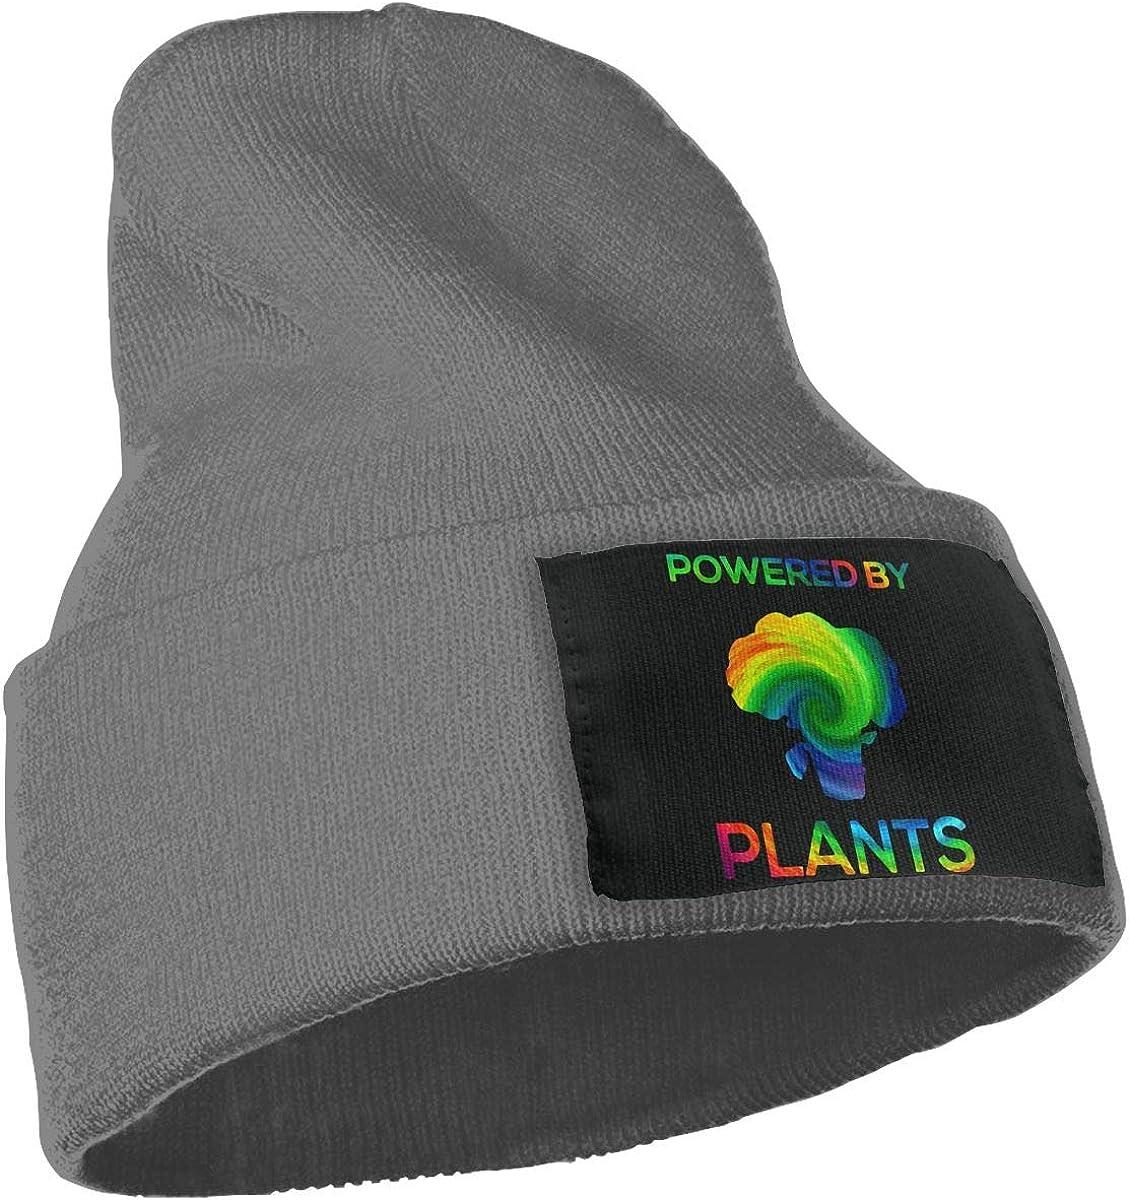 SLADDD1 Powered by Plants Vegan 3D Printing Warm Winter Hat Knit Beanie Skull Cap Cuff Beanie Hat Winter Hats for Men /& Women